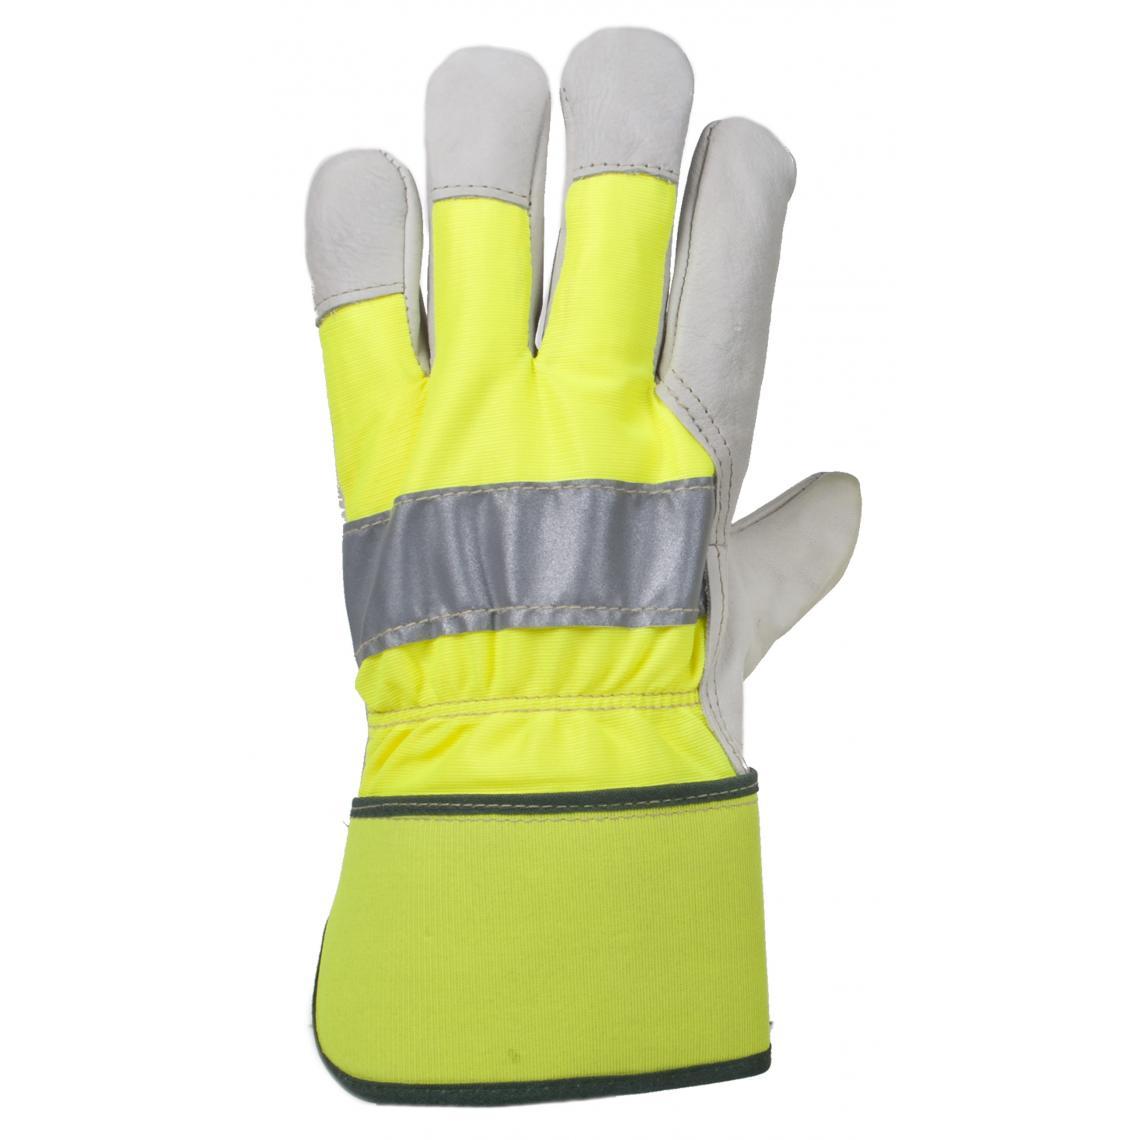 Hi-Vis Cowhide Leather Fitters Glove